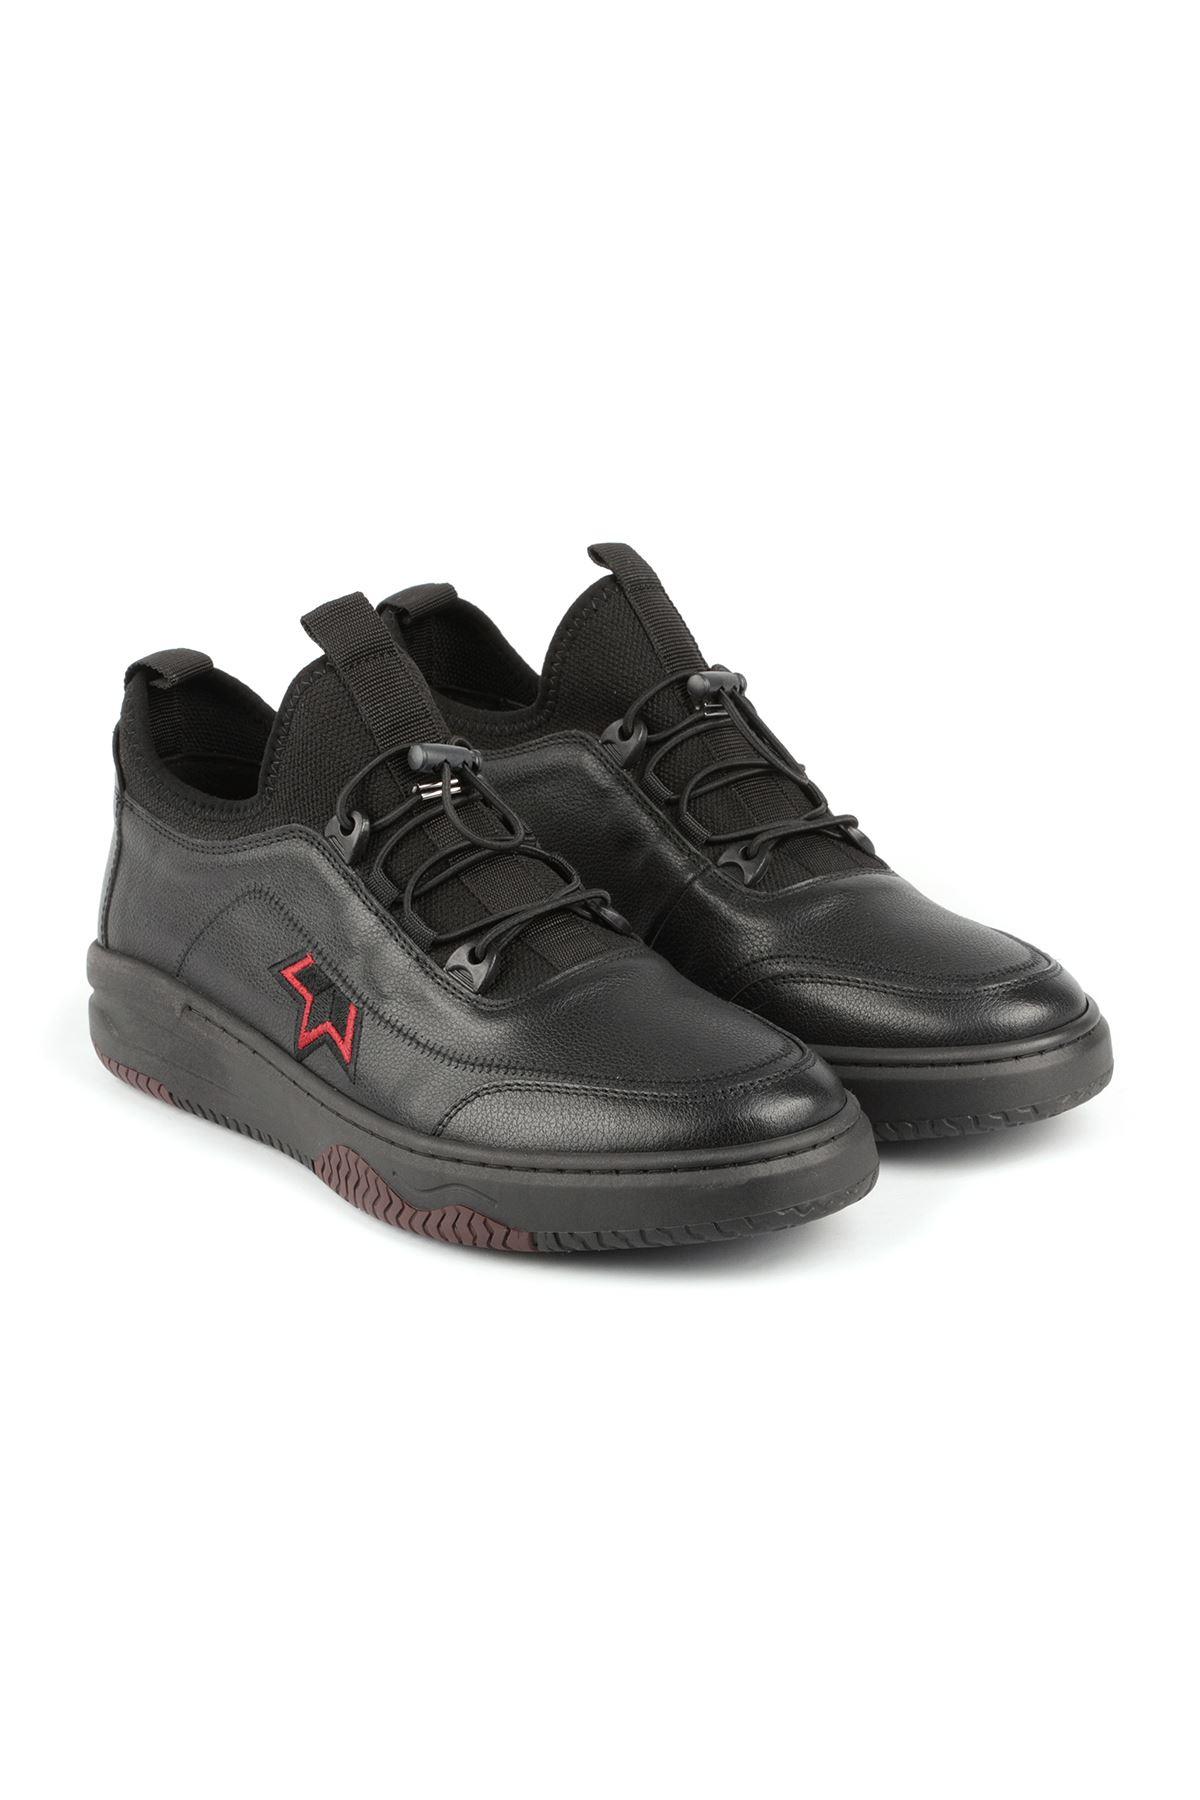 Libero L3546 Black Sports Shoes